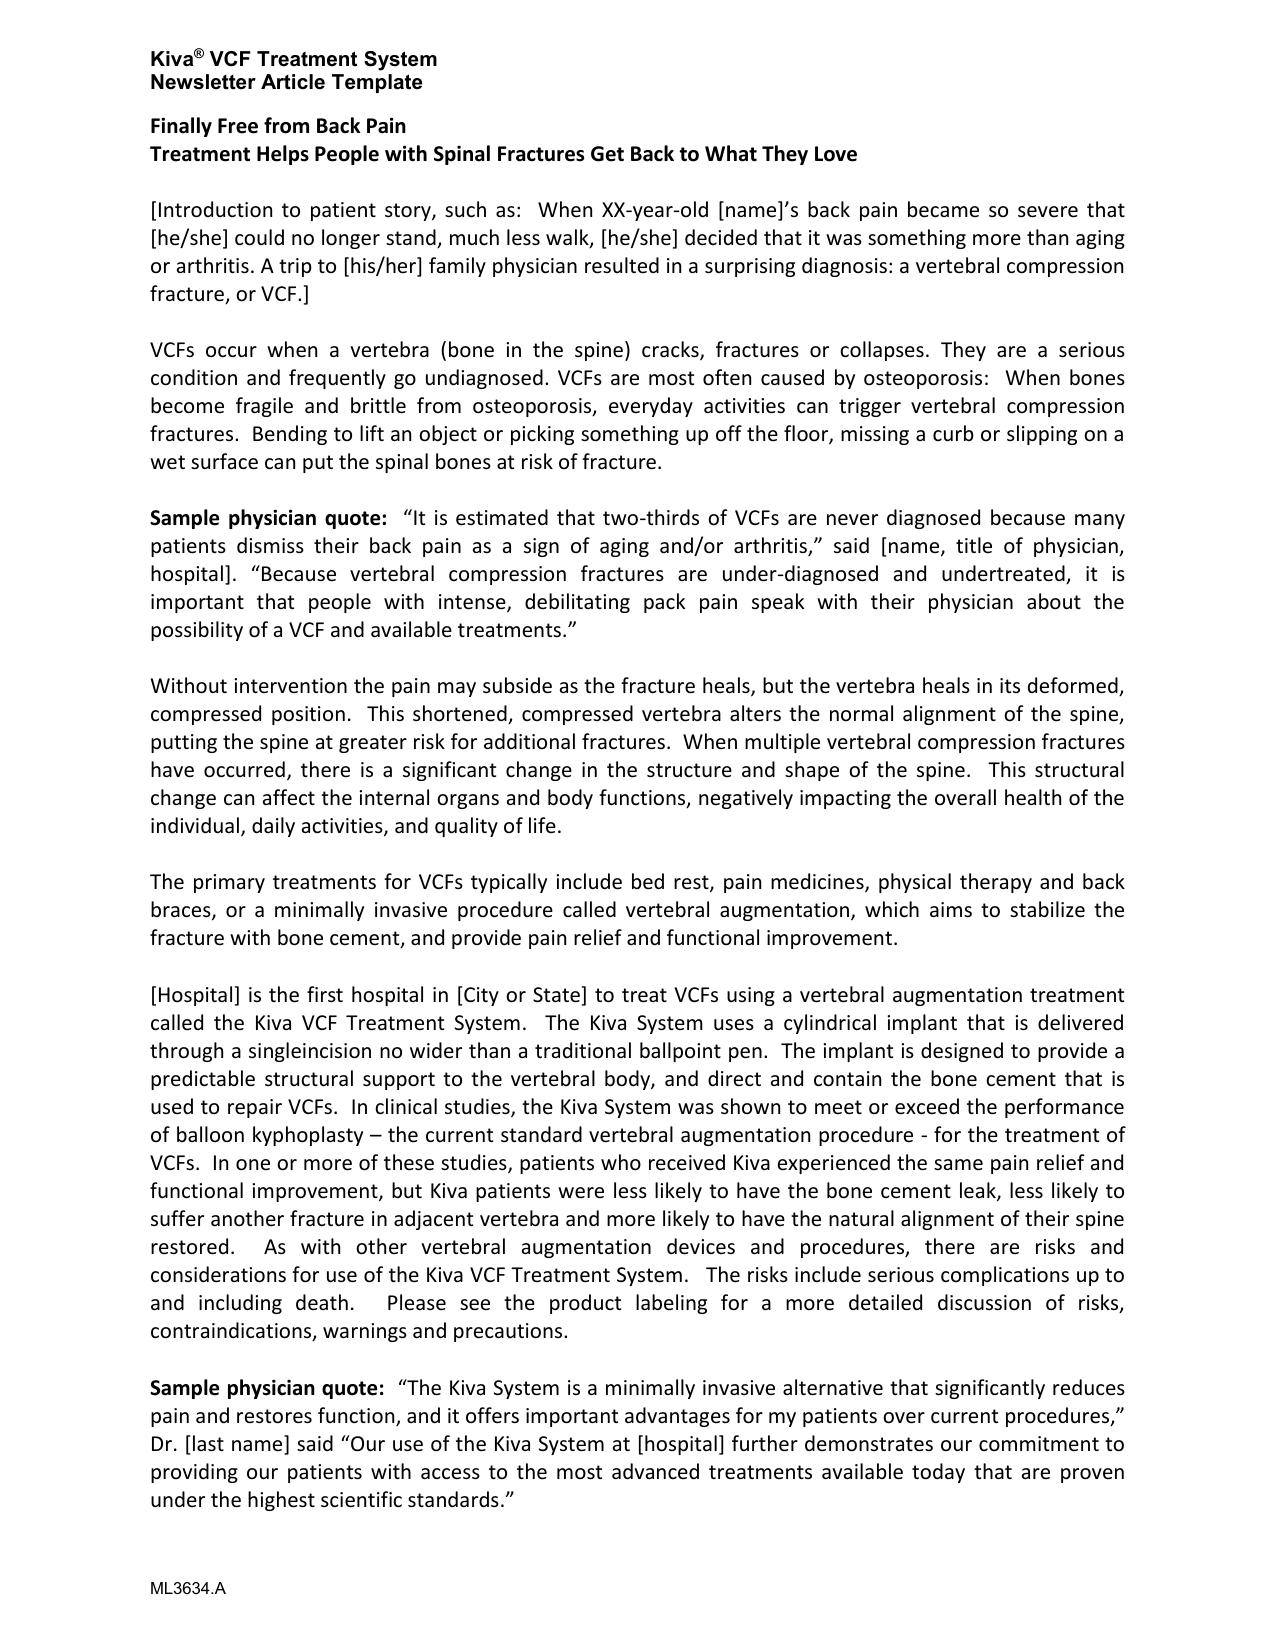 newsletter blog article template